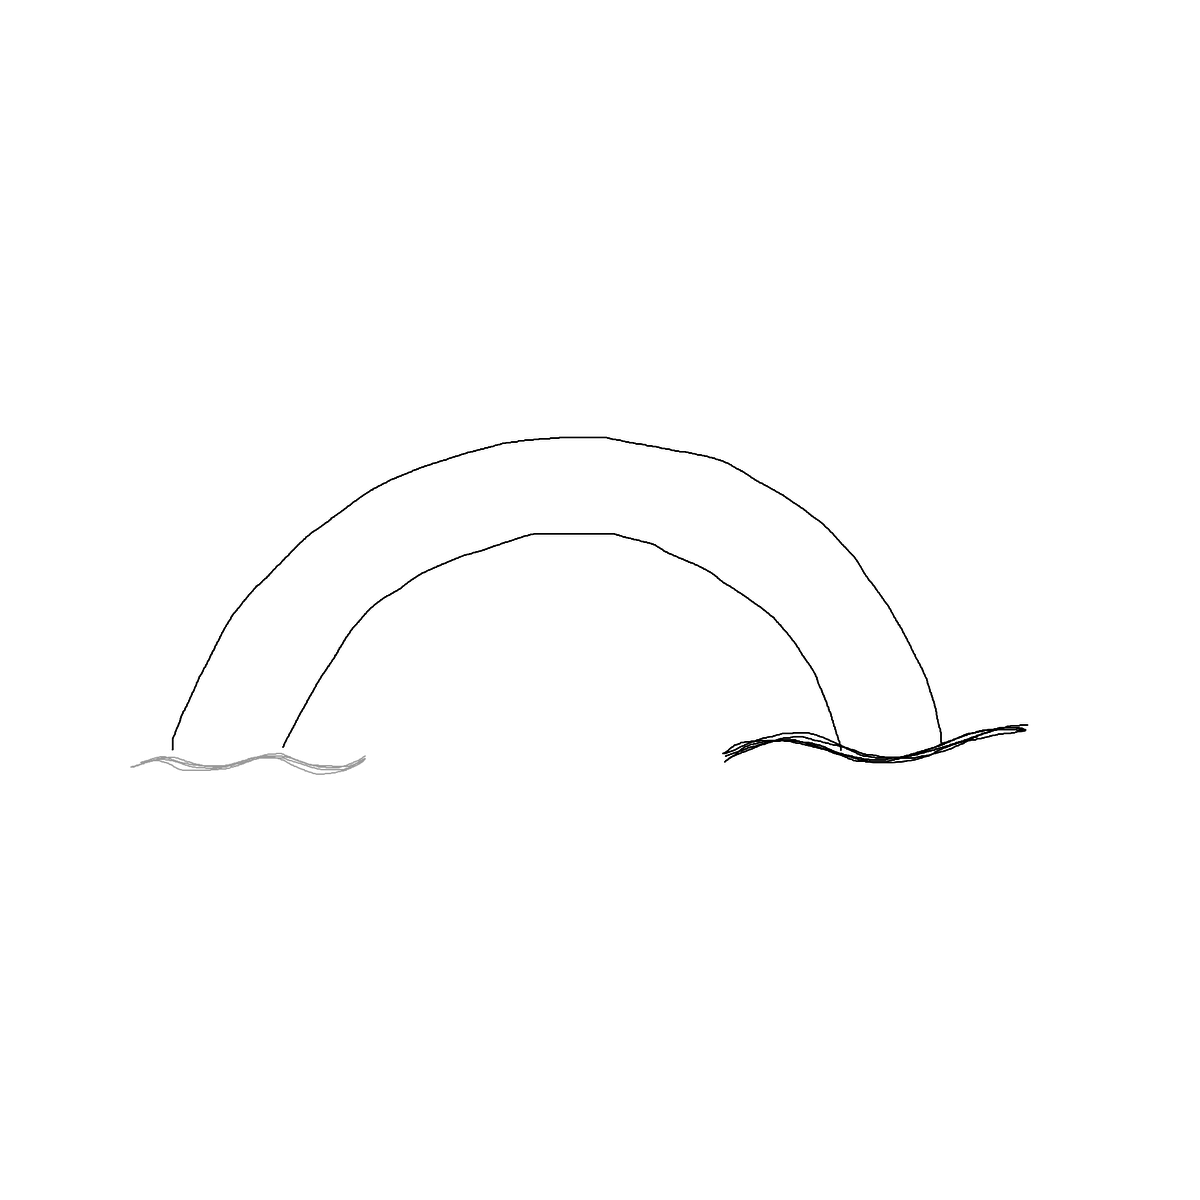 BAAAM drawing#2248 lat:43.4005279541015600lng: -1.7705792188644410